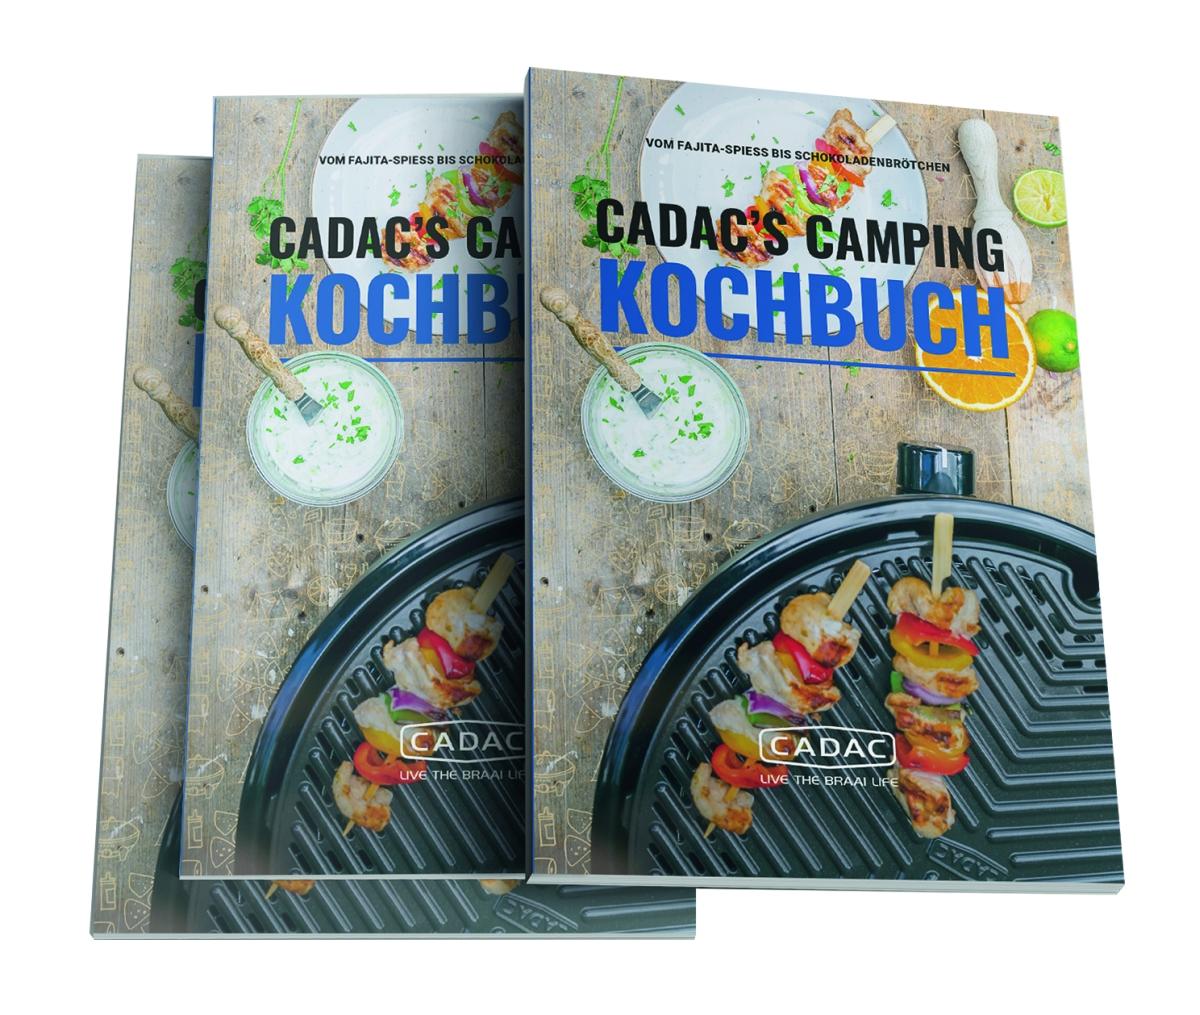 CADAC Camping- Kochbuch